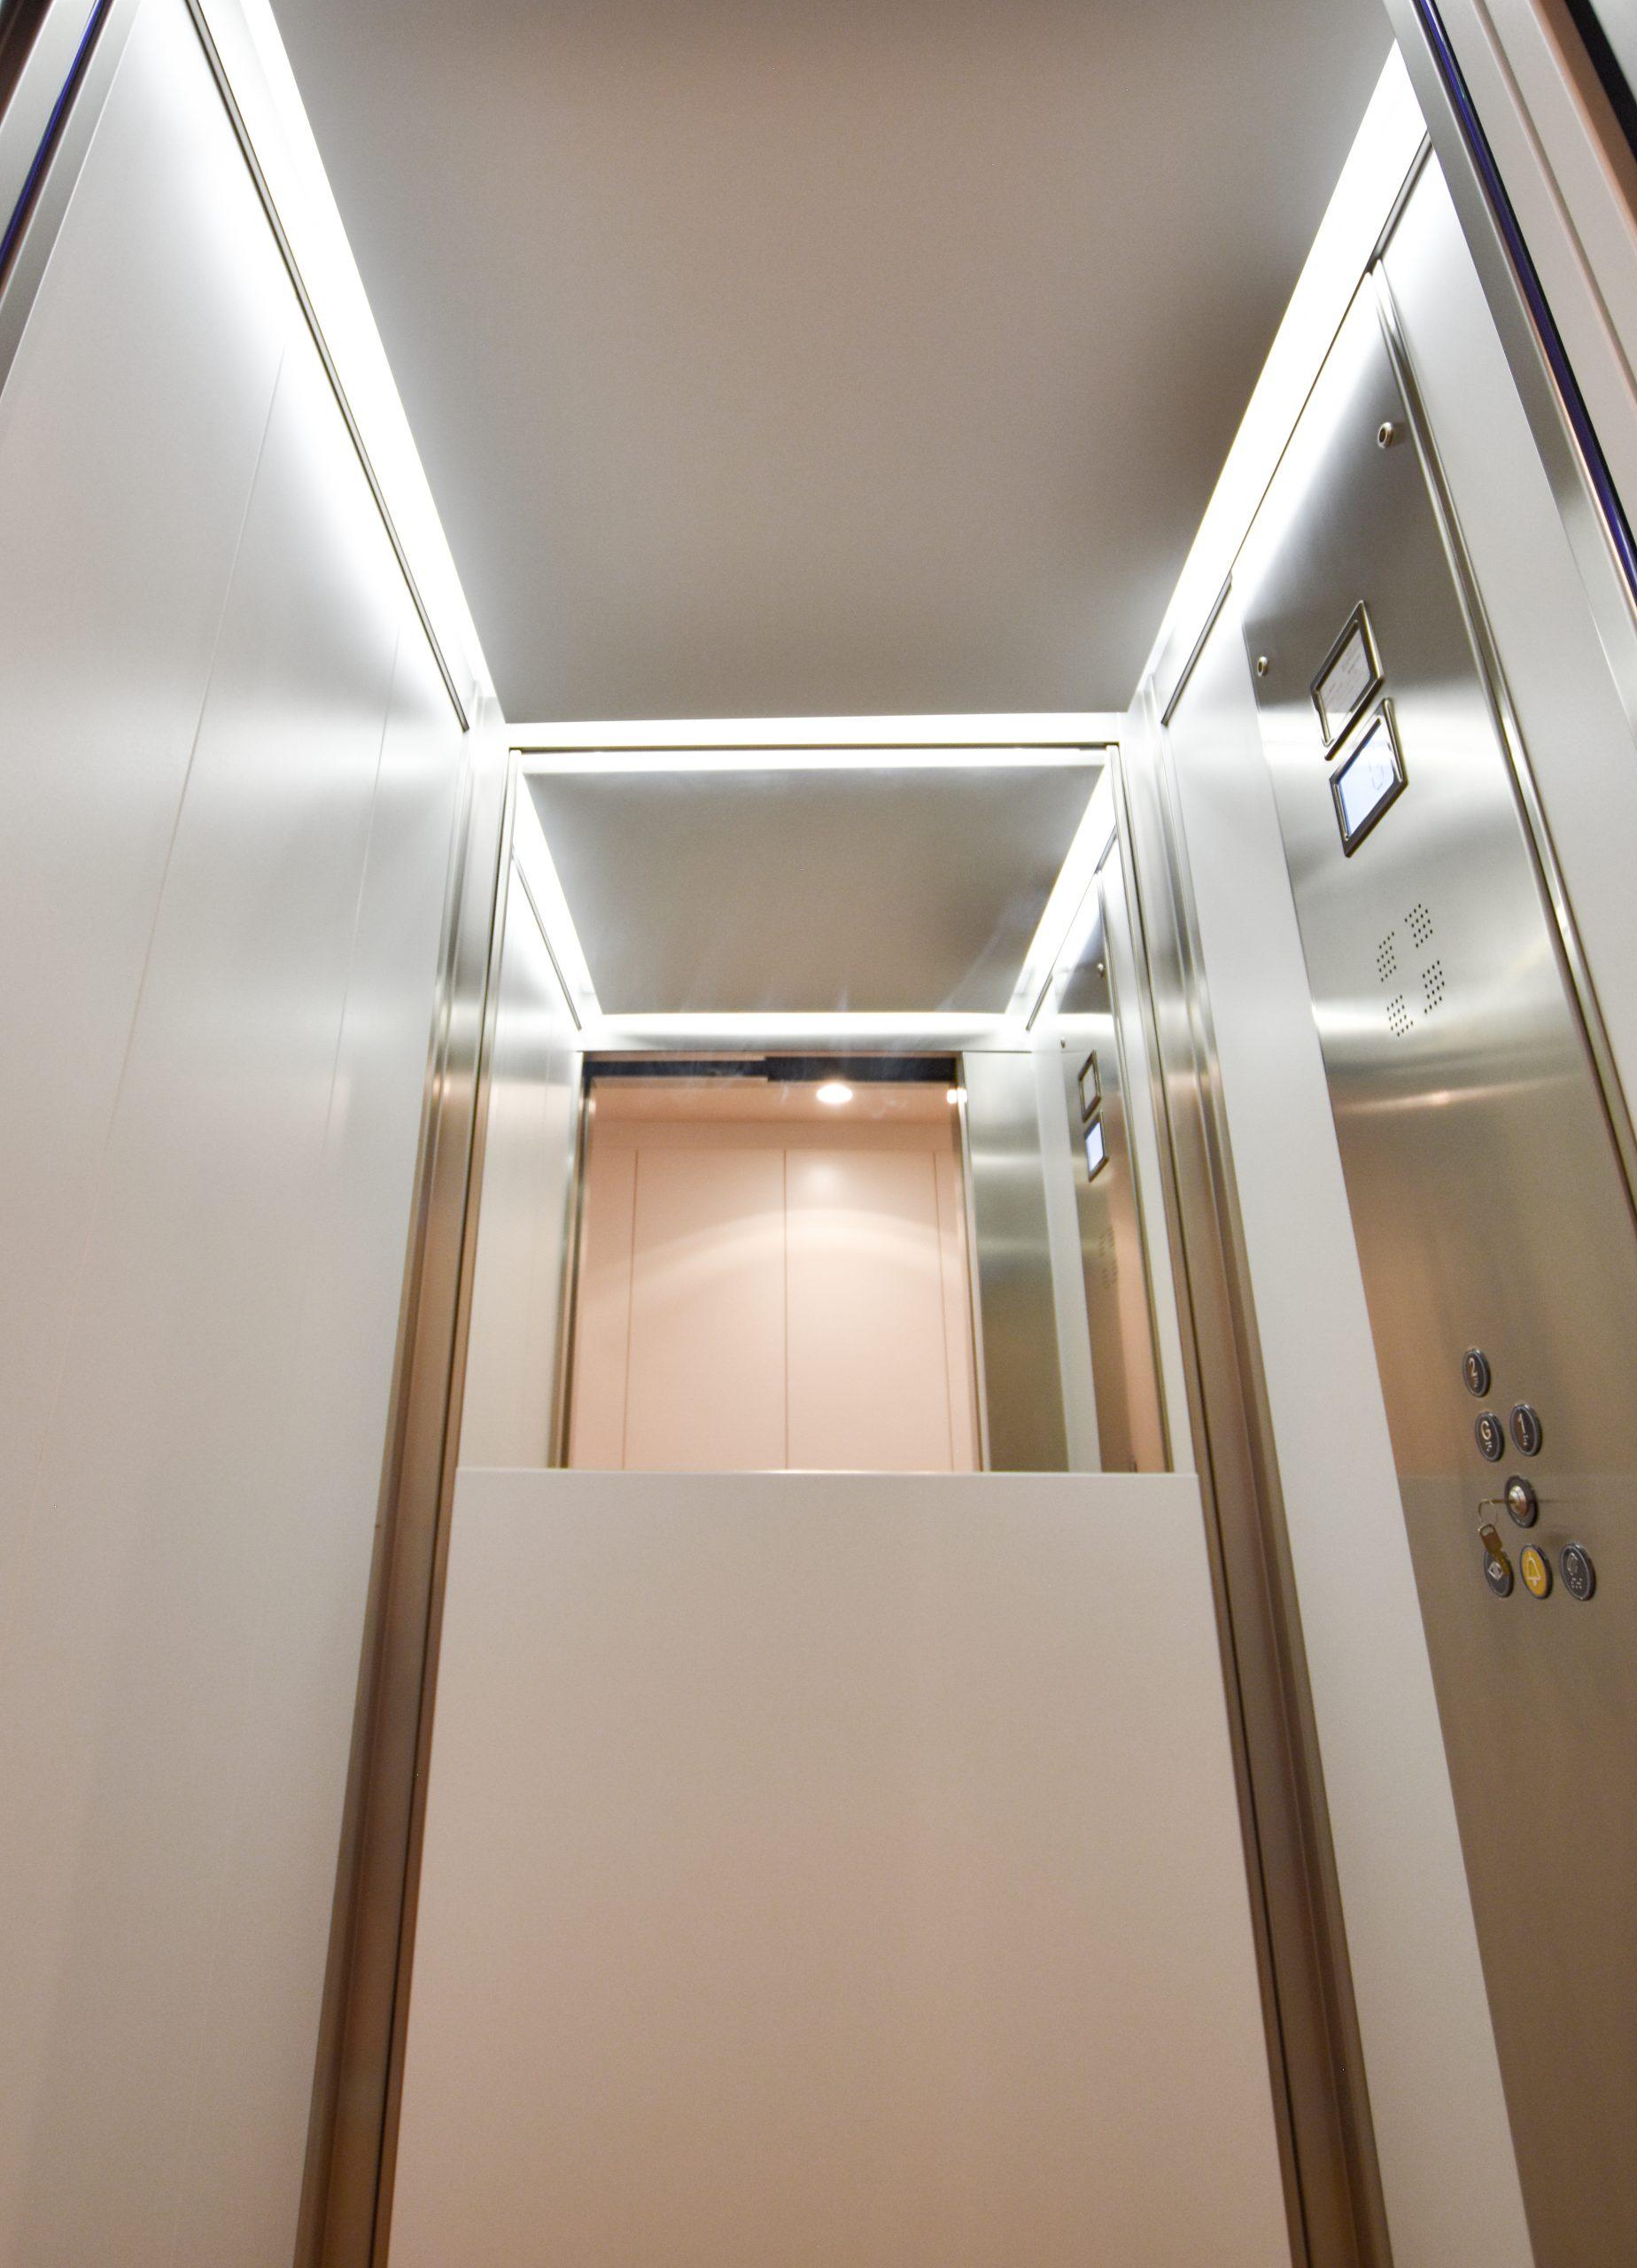 powerful home lifts perth - west coast elevators - jewel lift